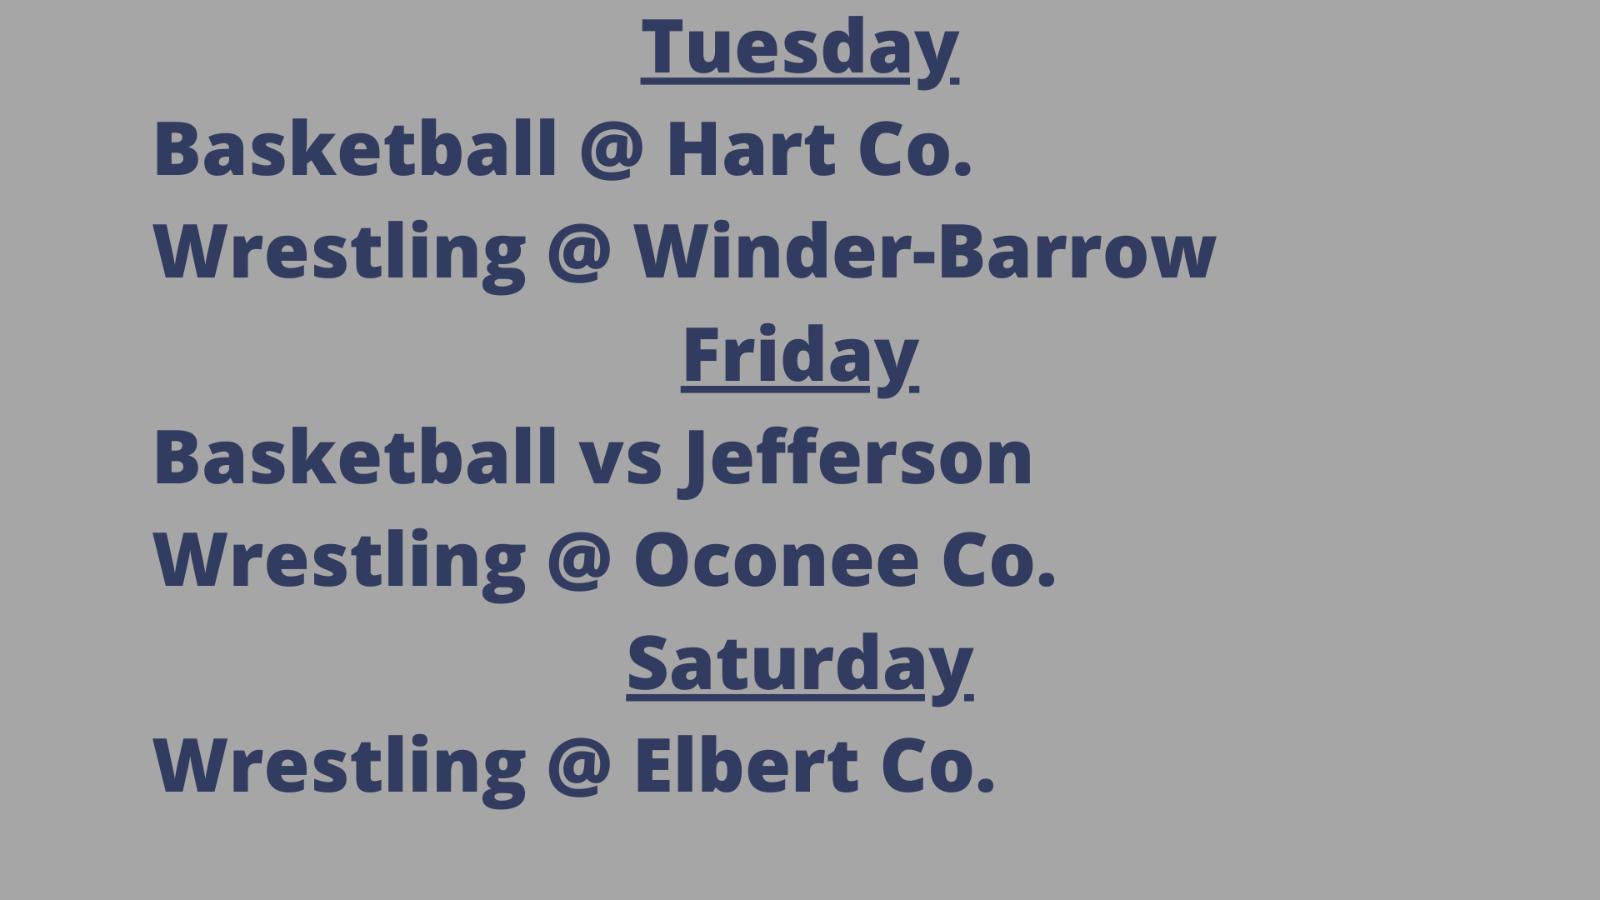 Weekly Athletic Schedule